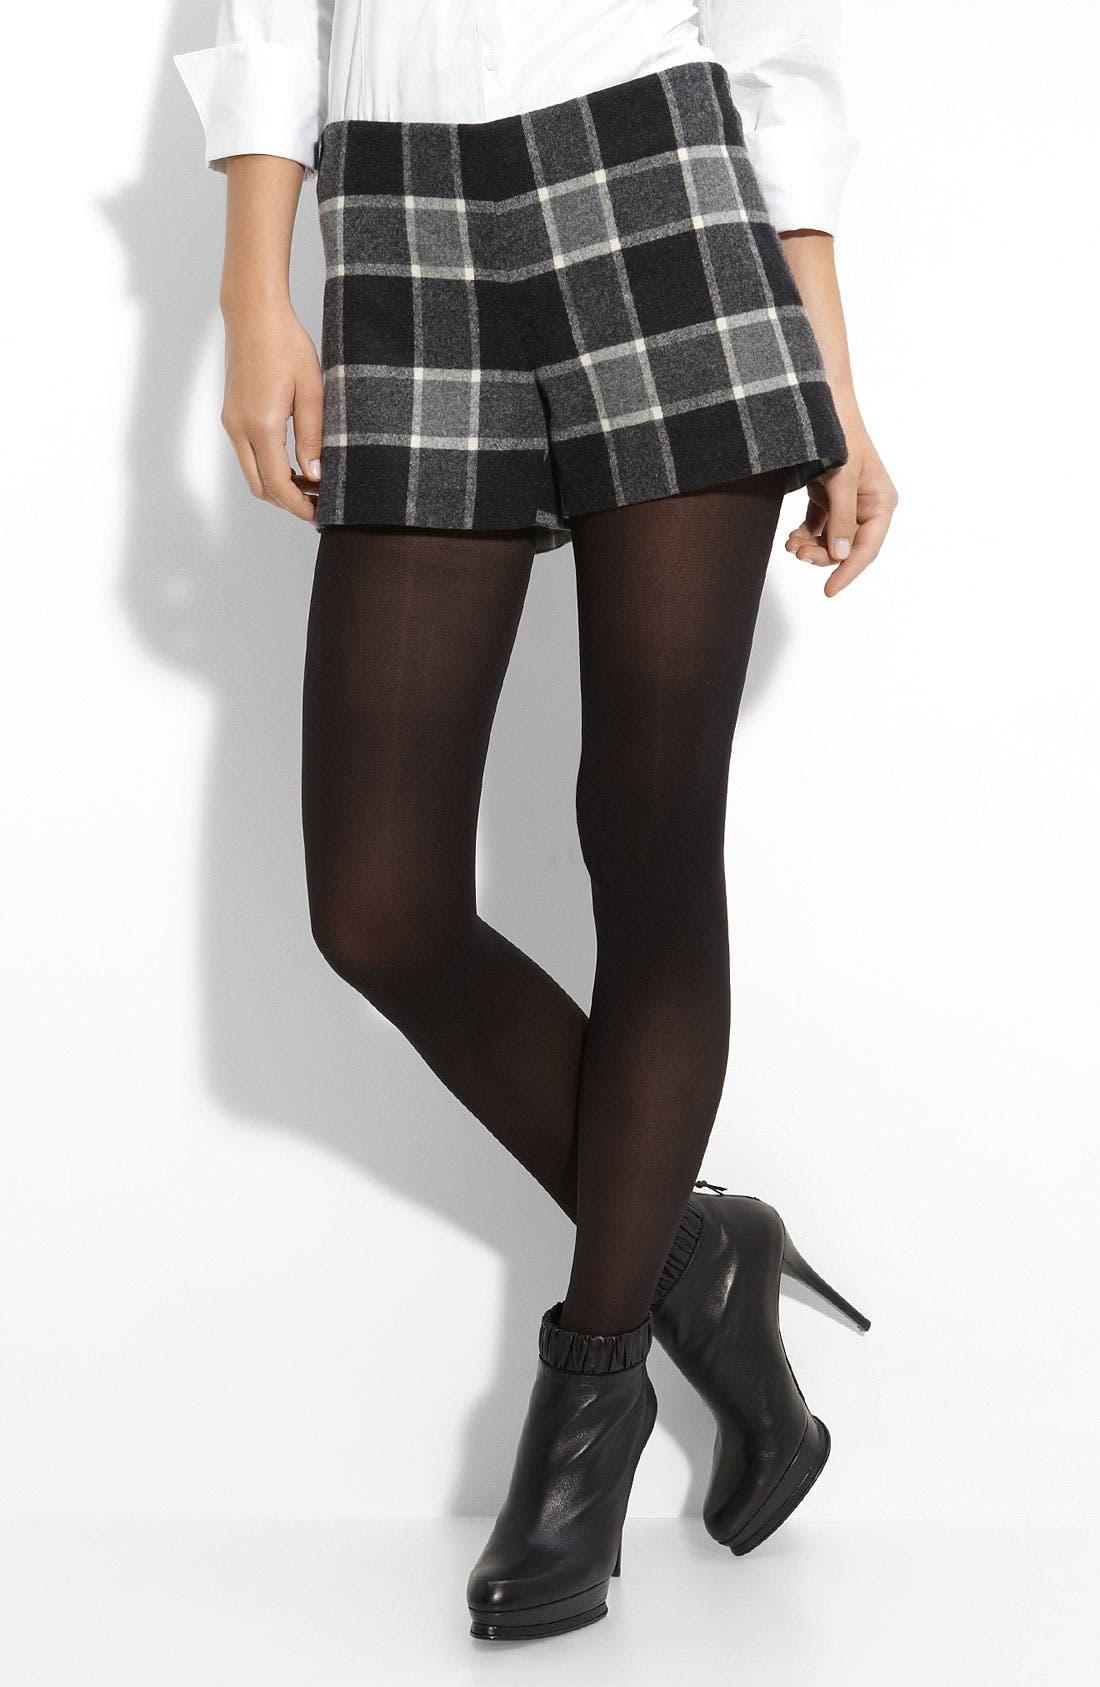 'Iselin - Blackfriars' Shorts,                         Main,                         color, Black/ Dark Charcoal